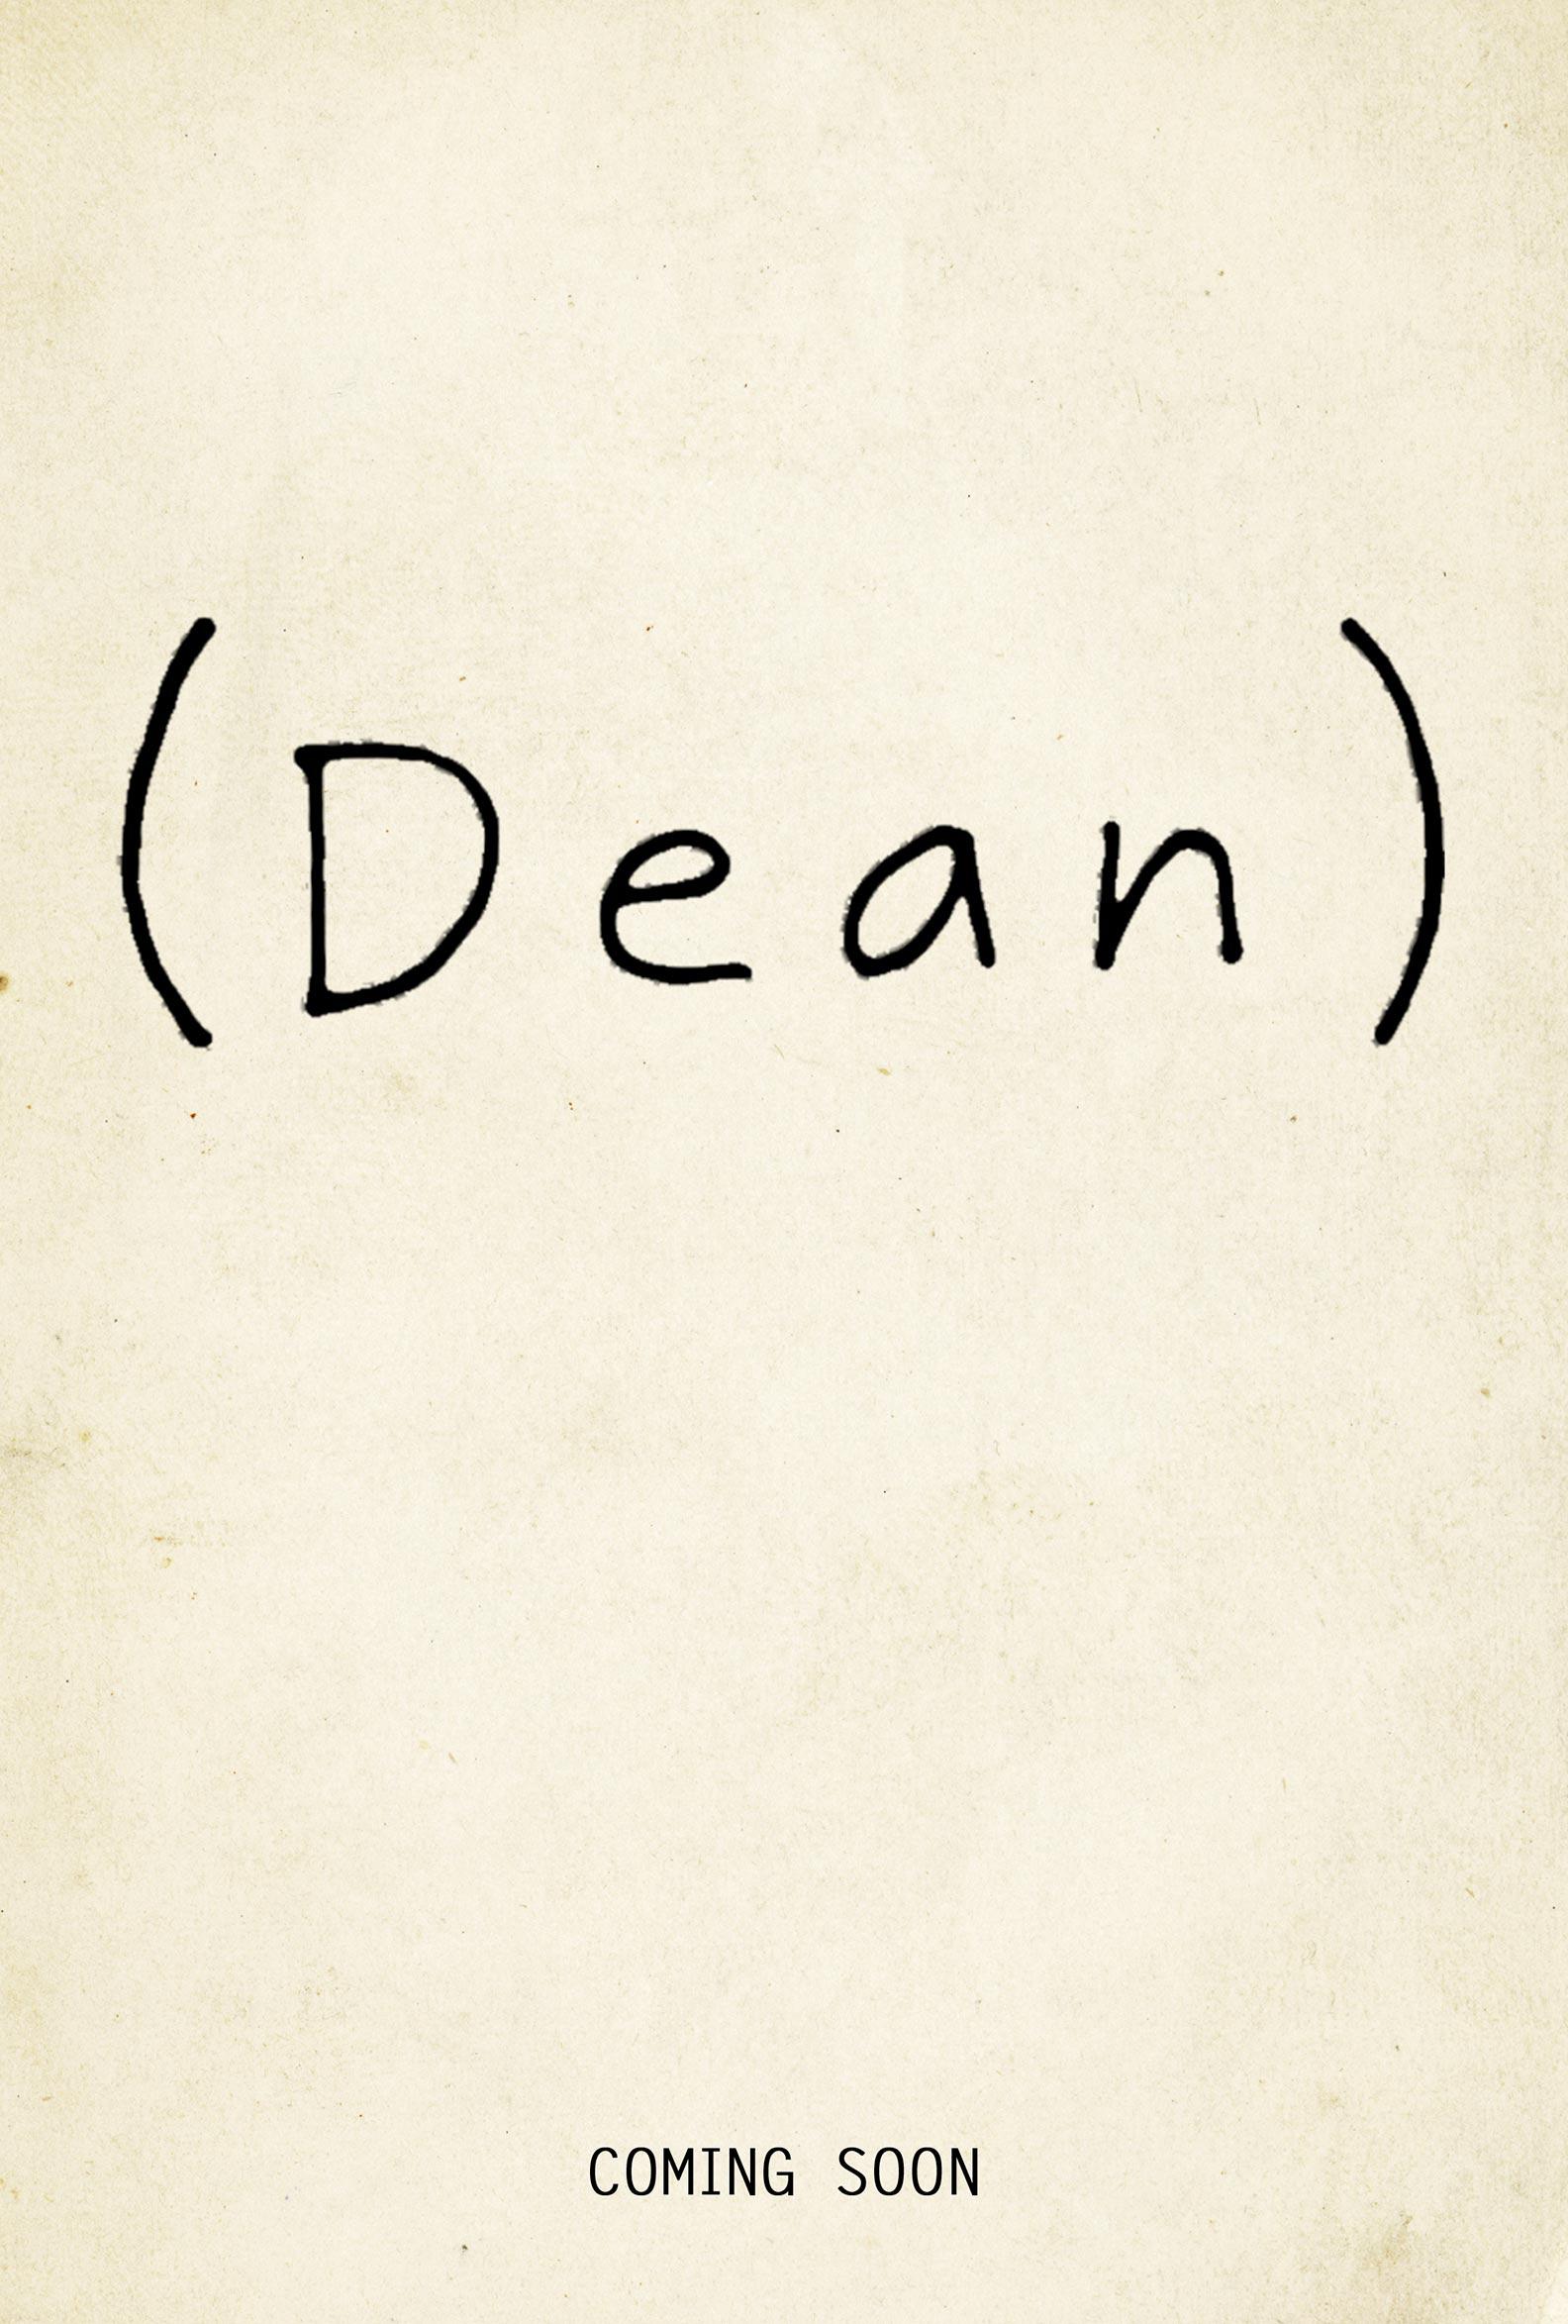 Dean Poster #1